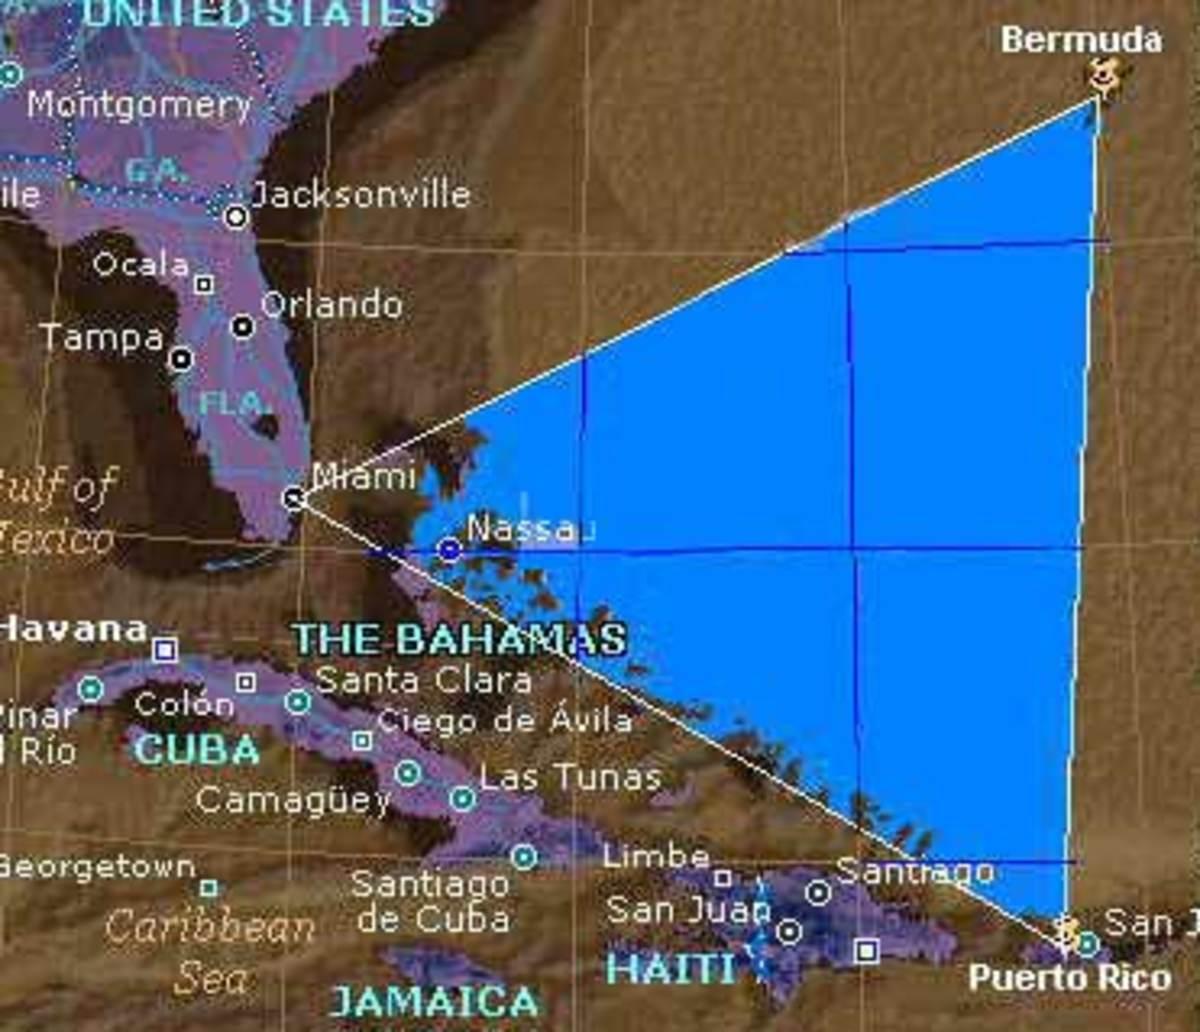 Mystery of the Bermuda Triangle